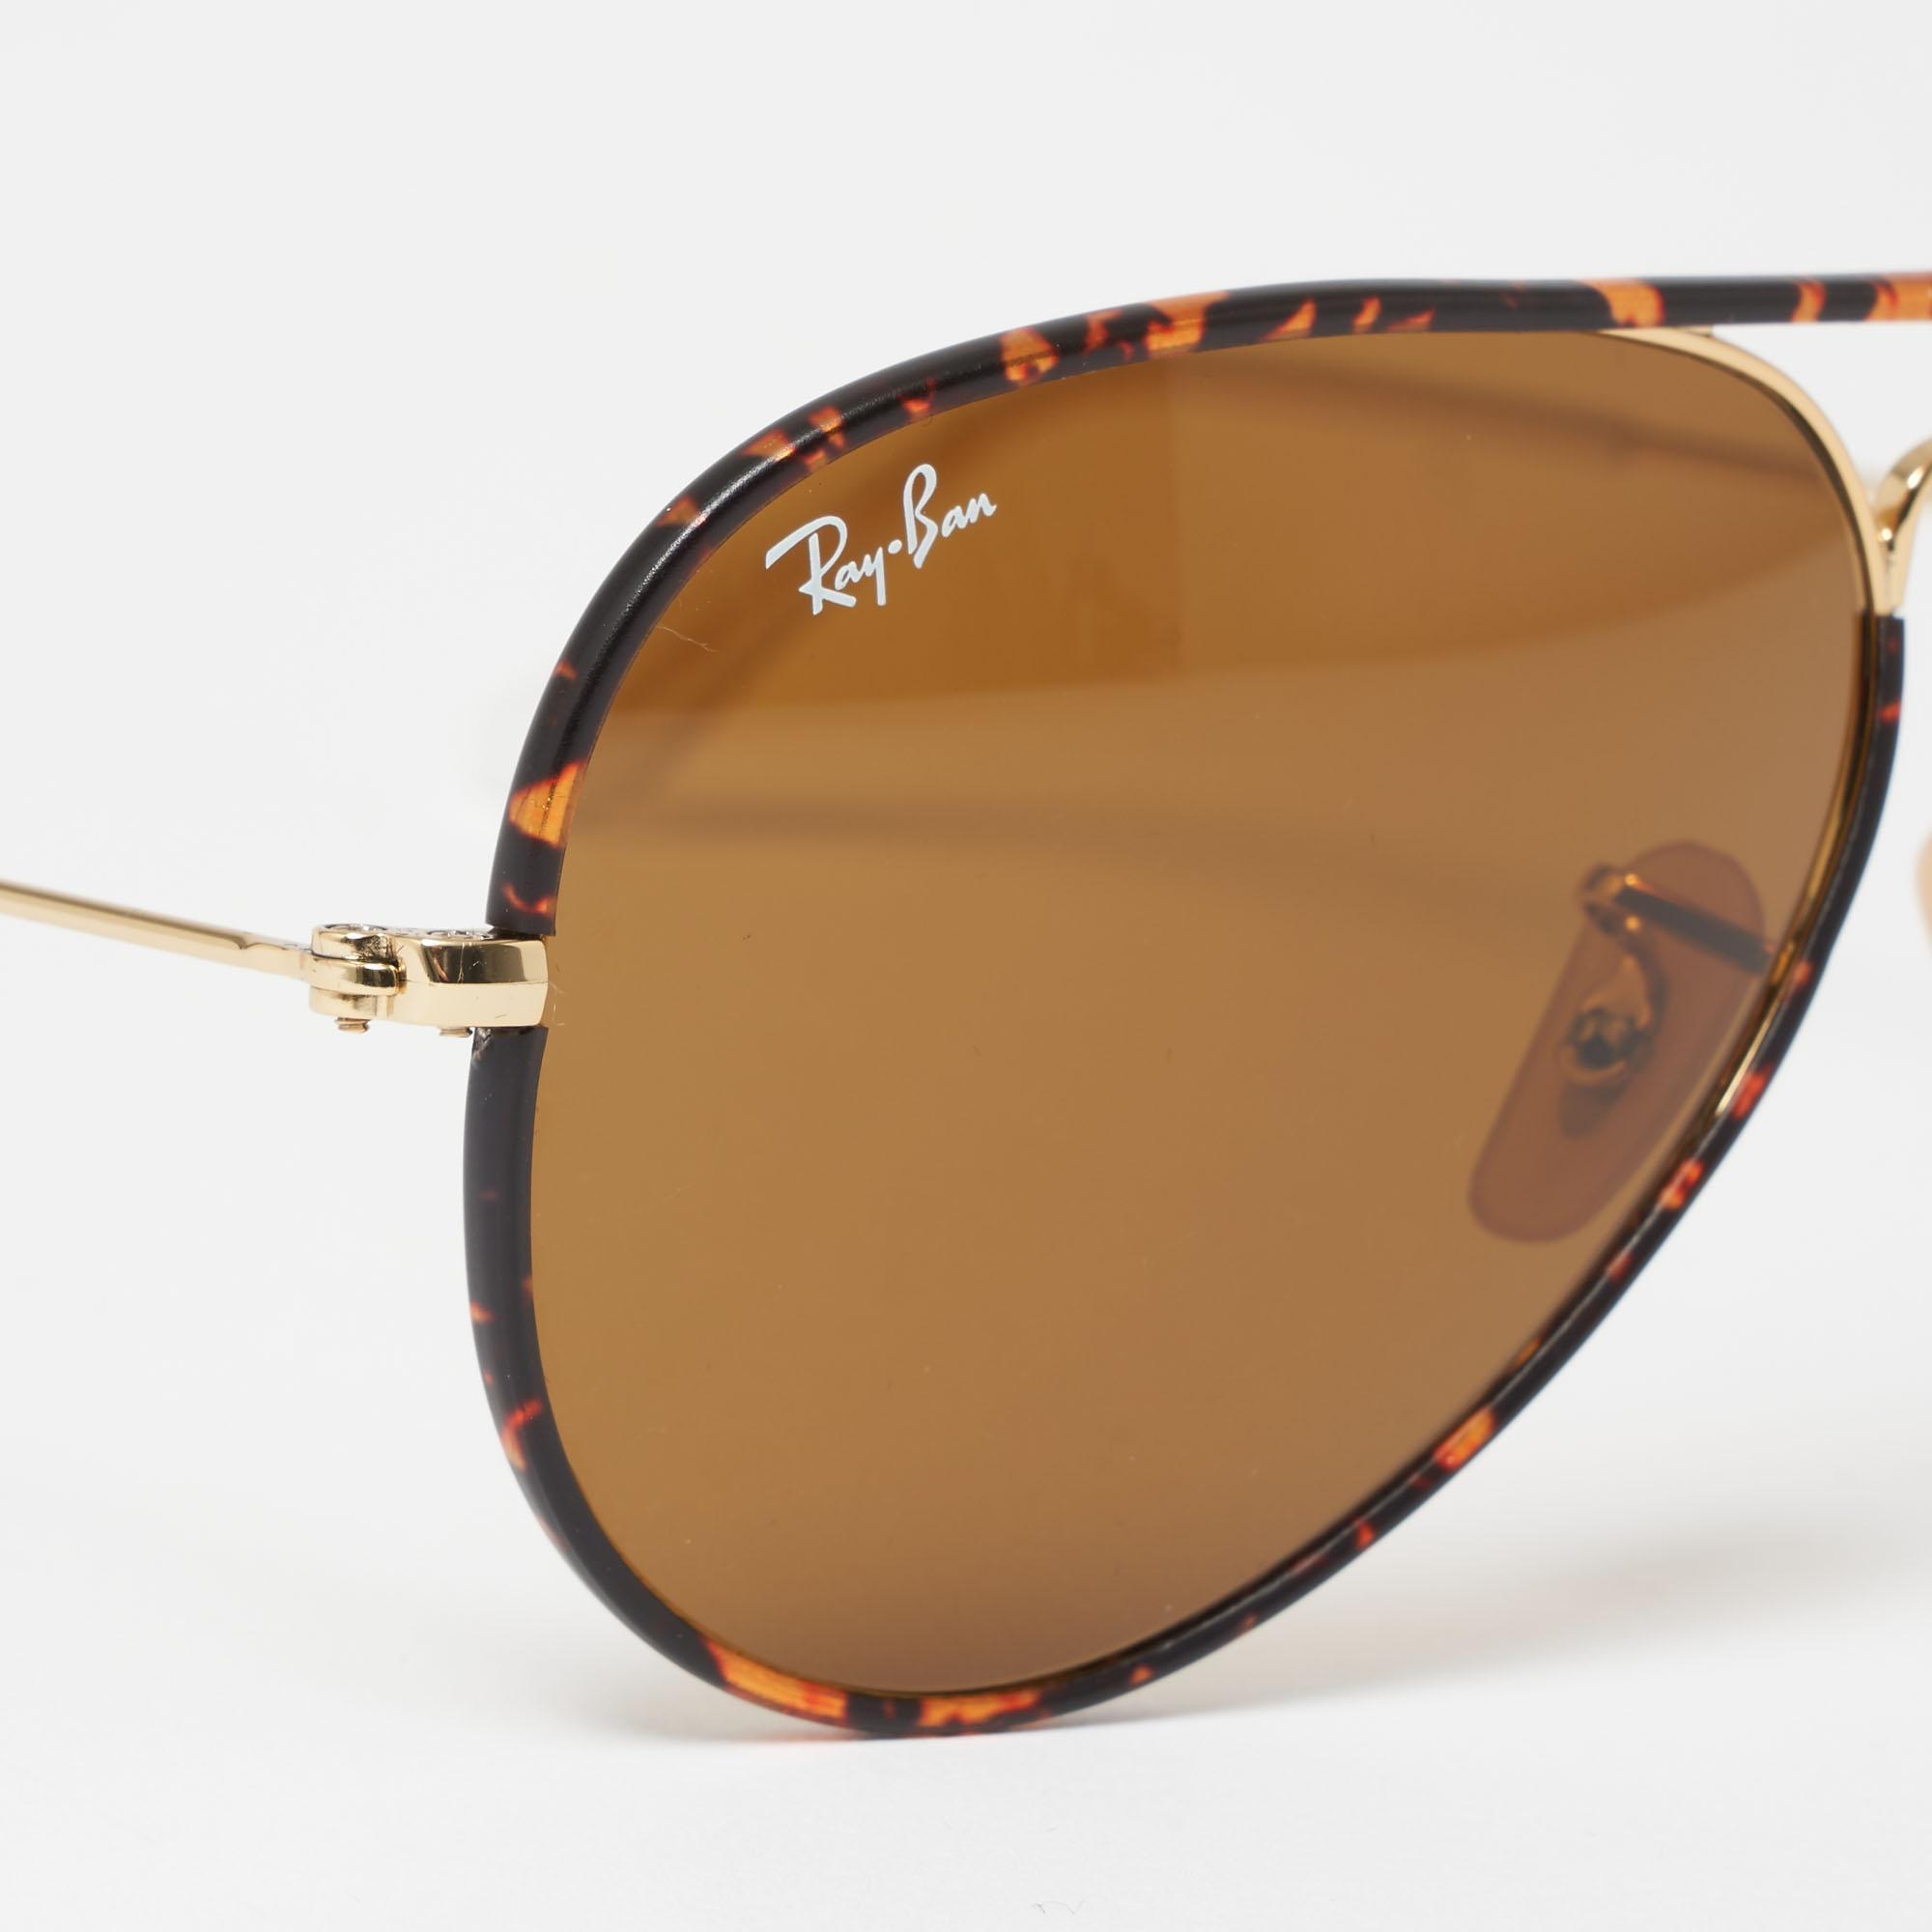 13eaba7415d8b Ray-Ban - Multicolor Tortoise Aviator Full Colour Sunglasses - Brown  Classic B-15. View fullscreen